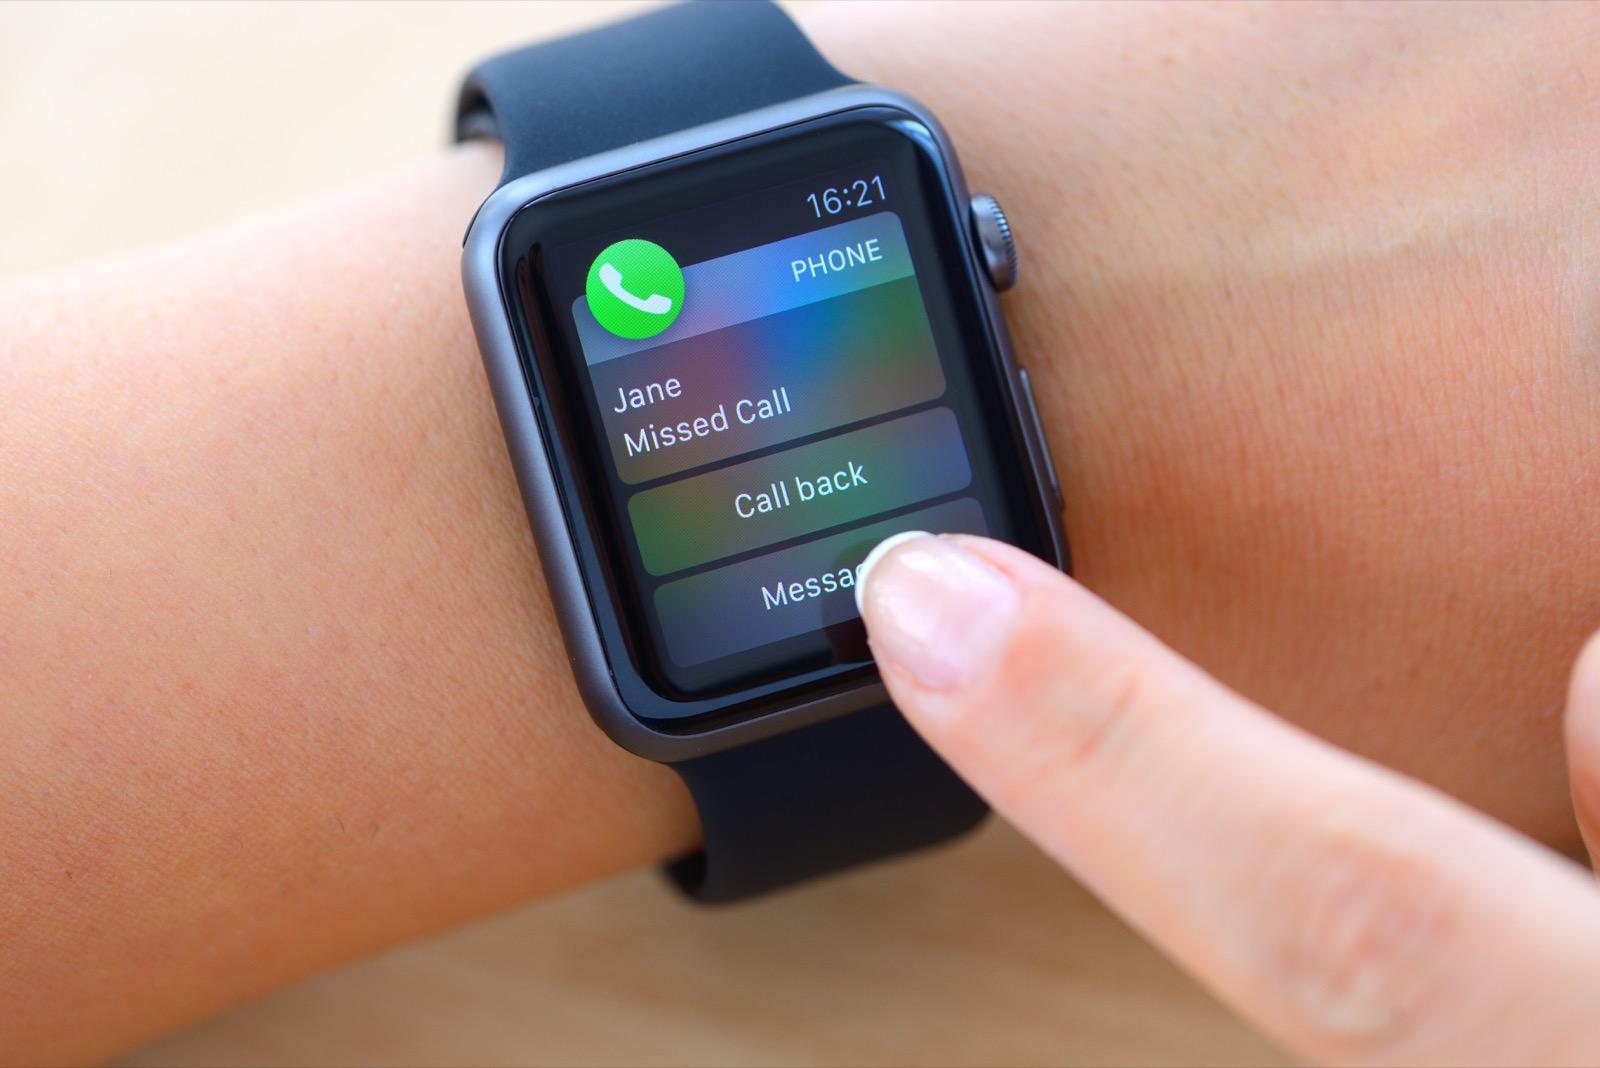 Missed-call-on-Apple-Watch-486165124_7360x4912 (2)_Web.jpeg